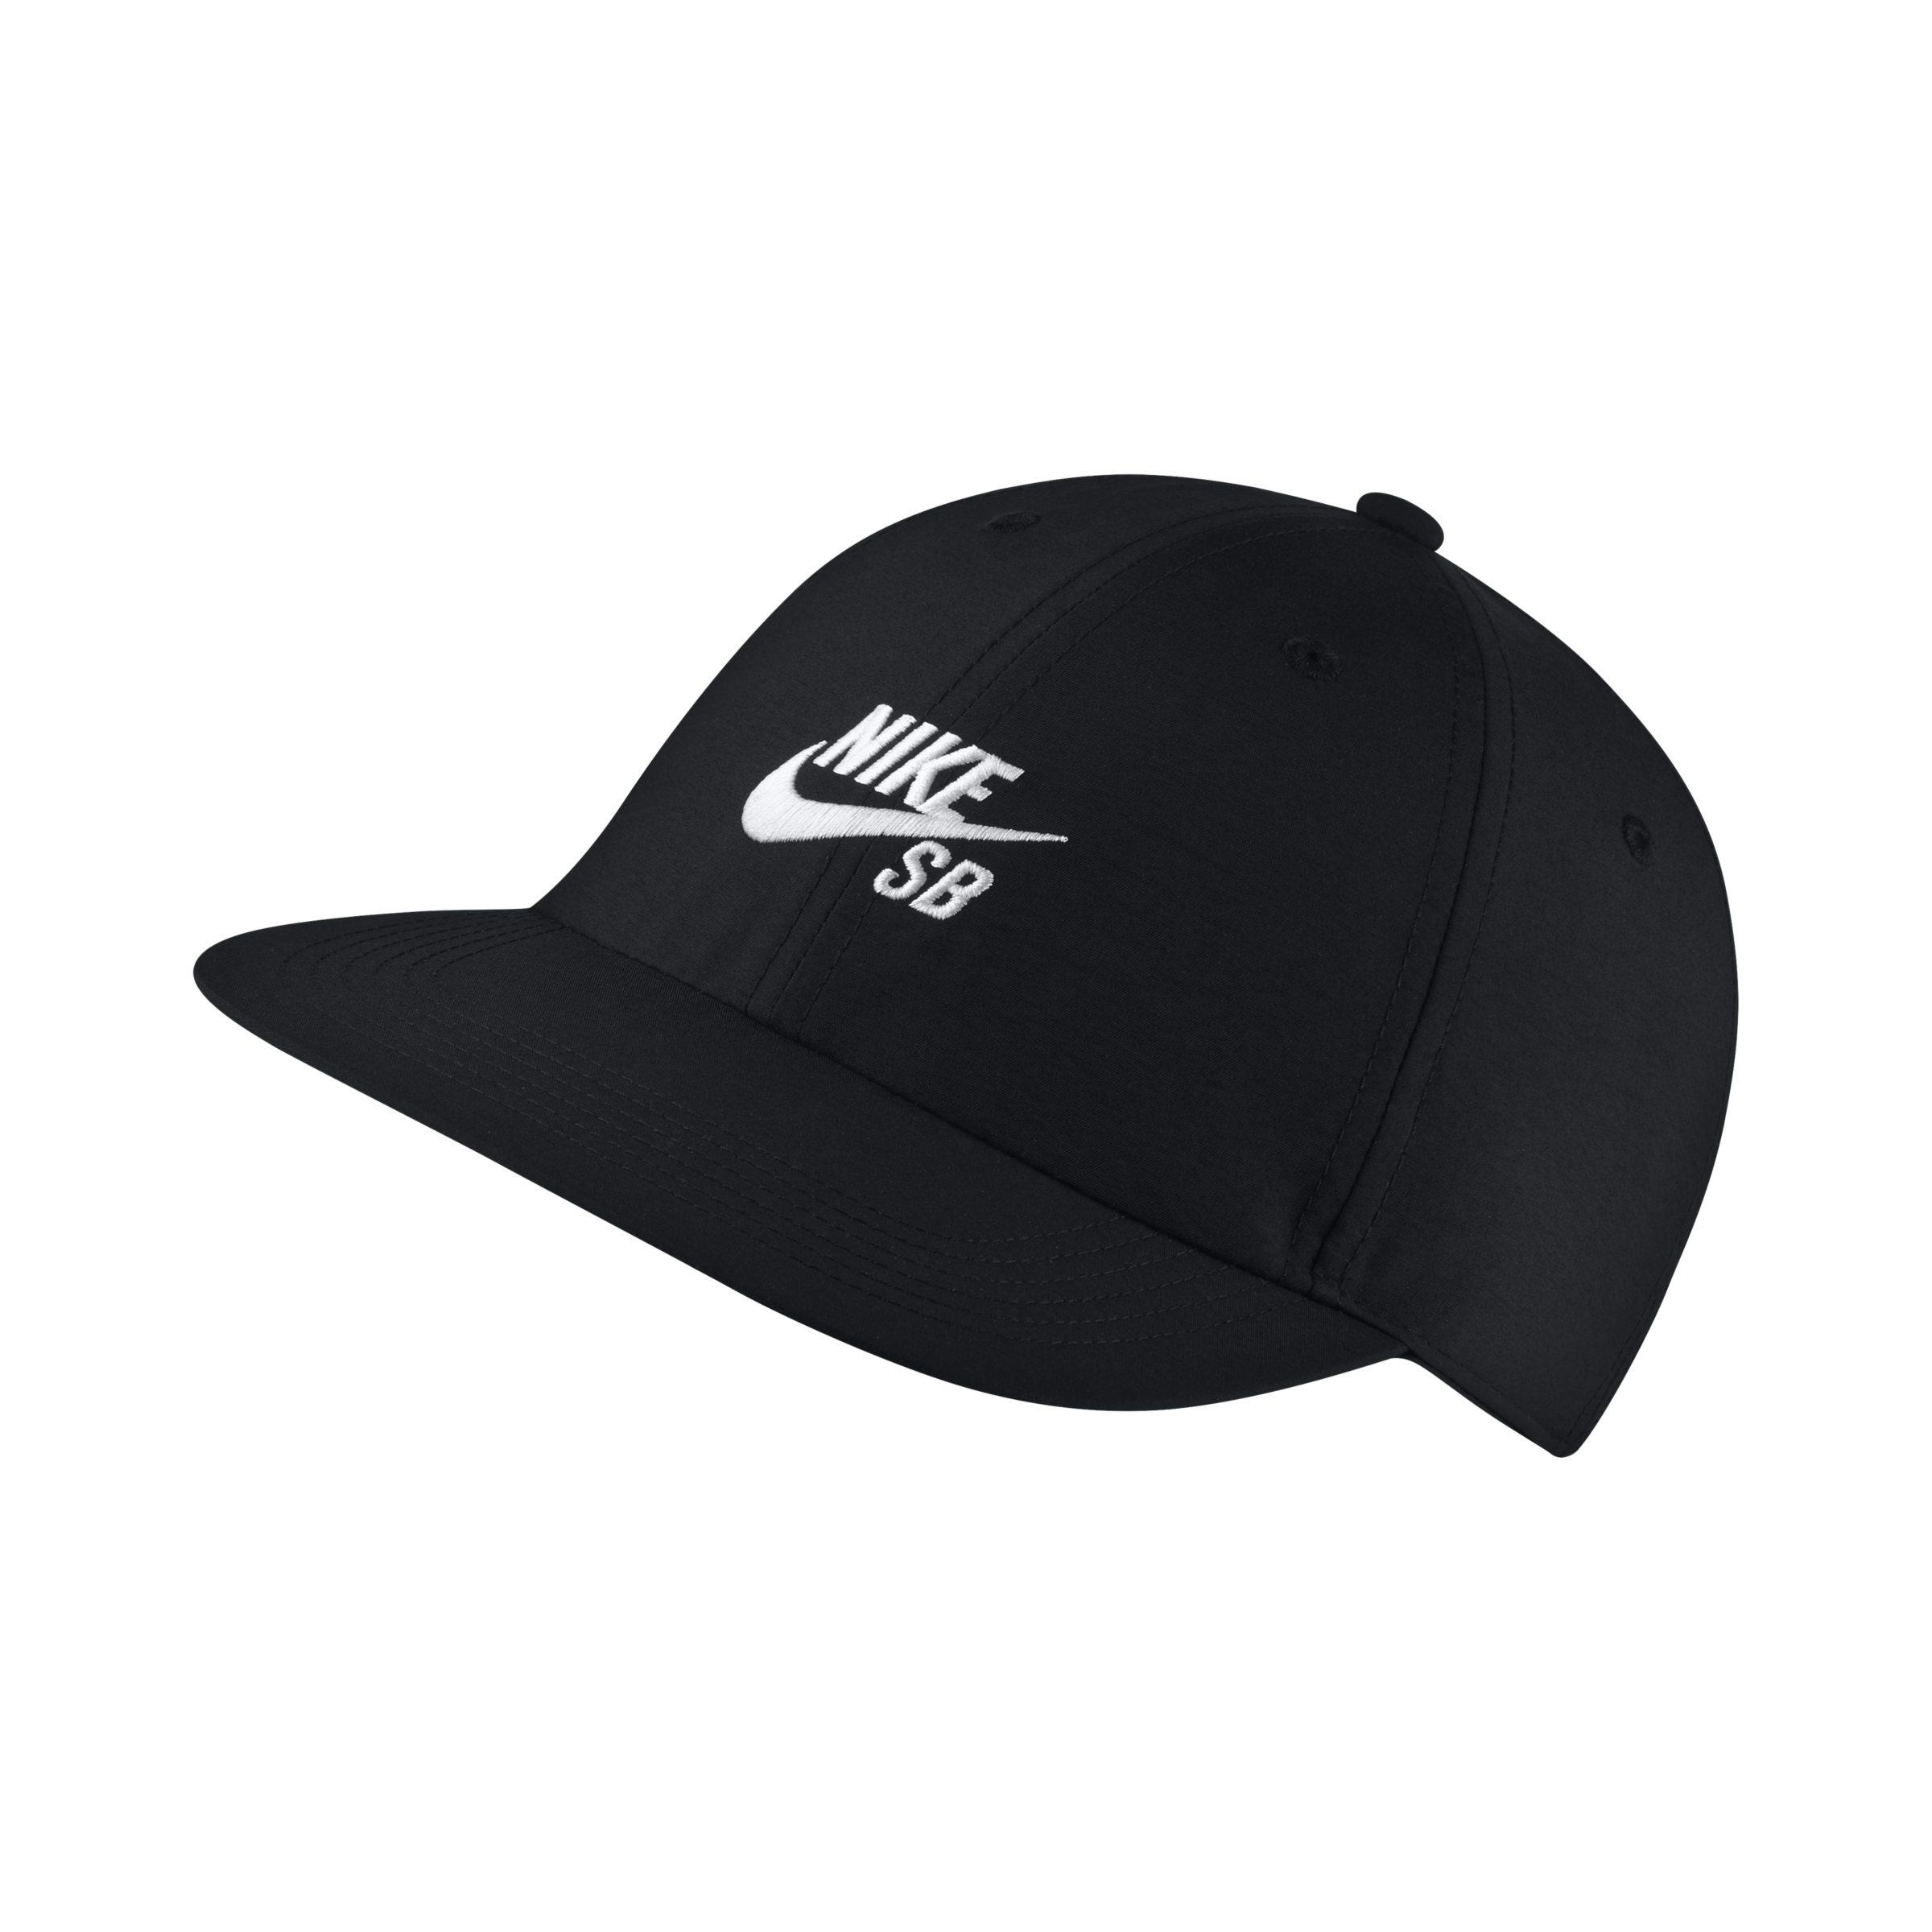 0b344f896c6 Nike Sb Heritage86 Skateboarding Hat in Black - Lyst